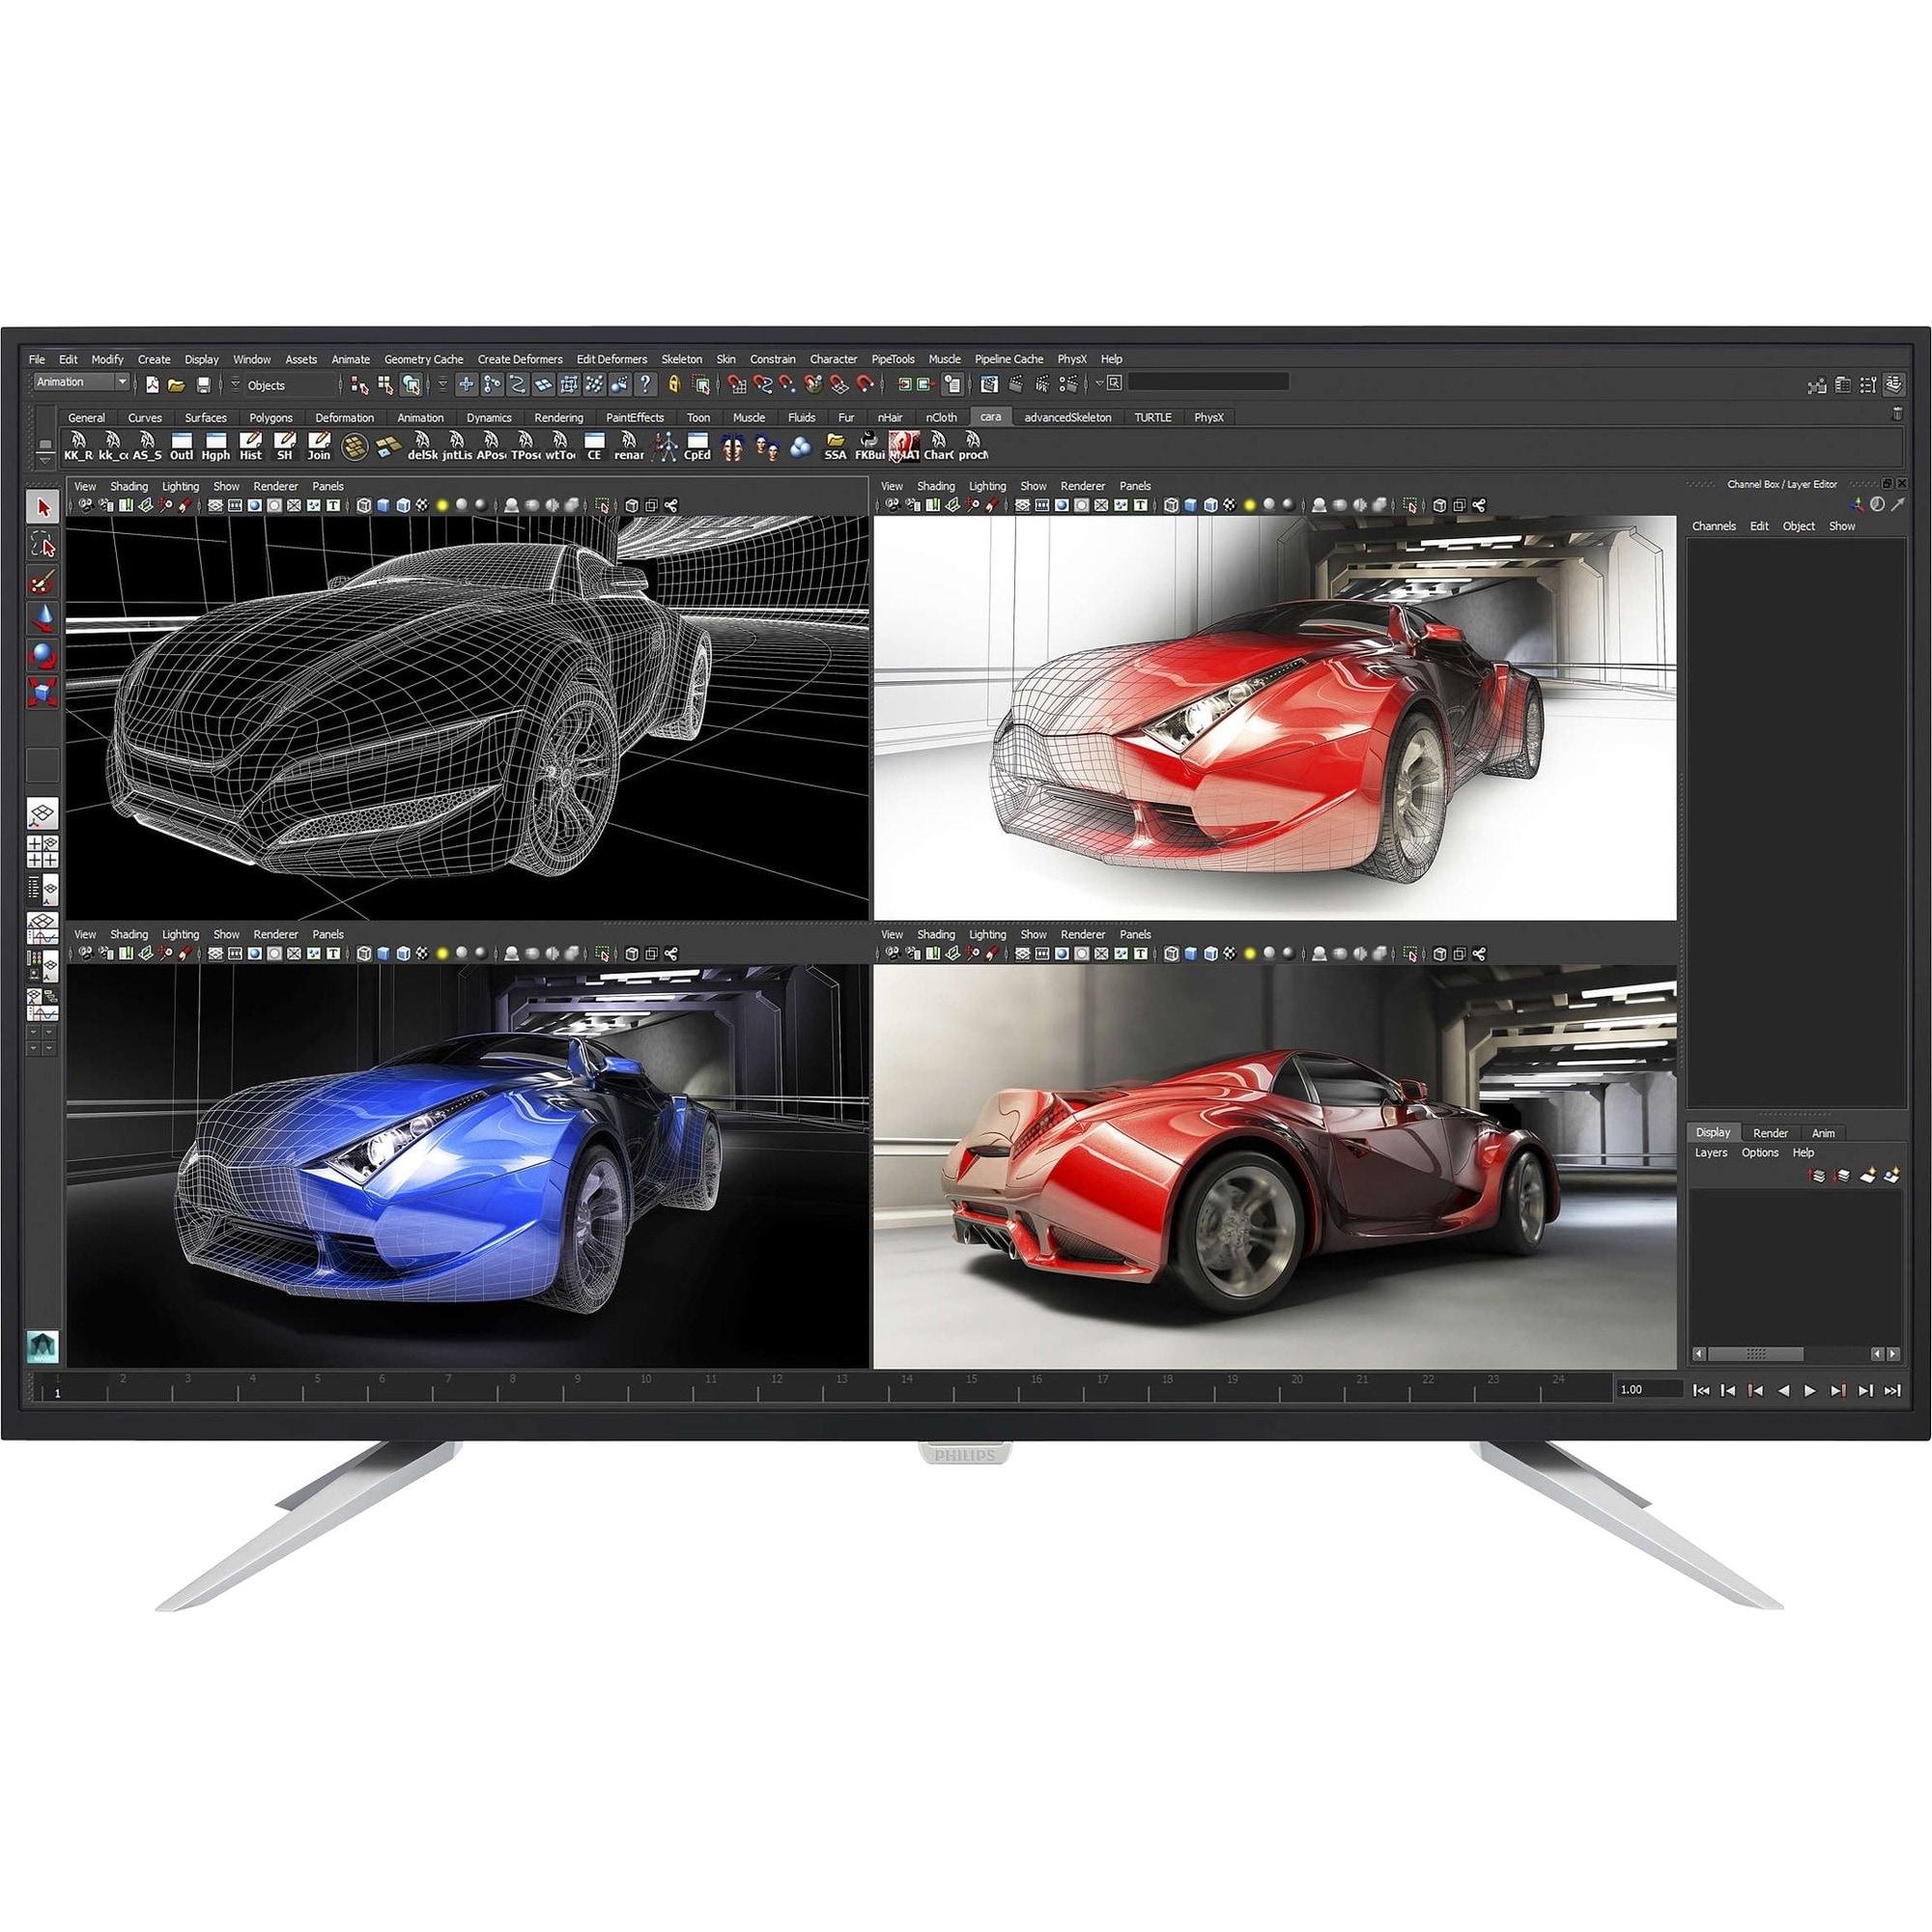 "Philips Brilliance BDM4350UC 43"" LED LCD Monitor - 16:9 -..."